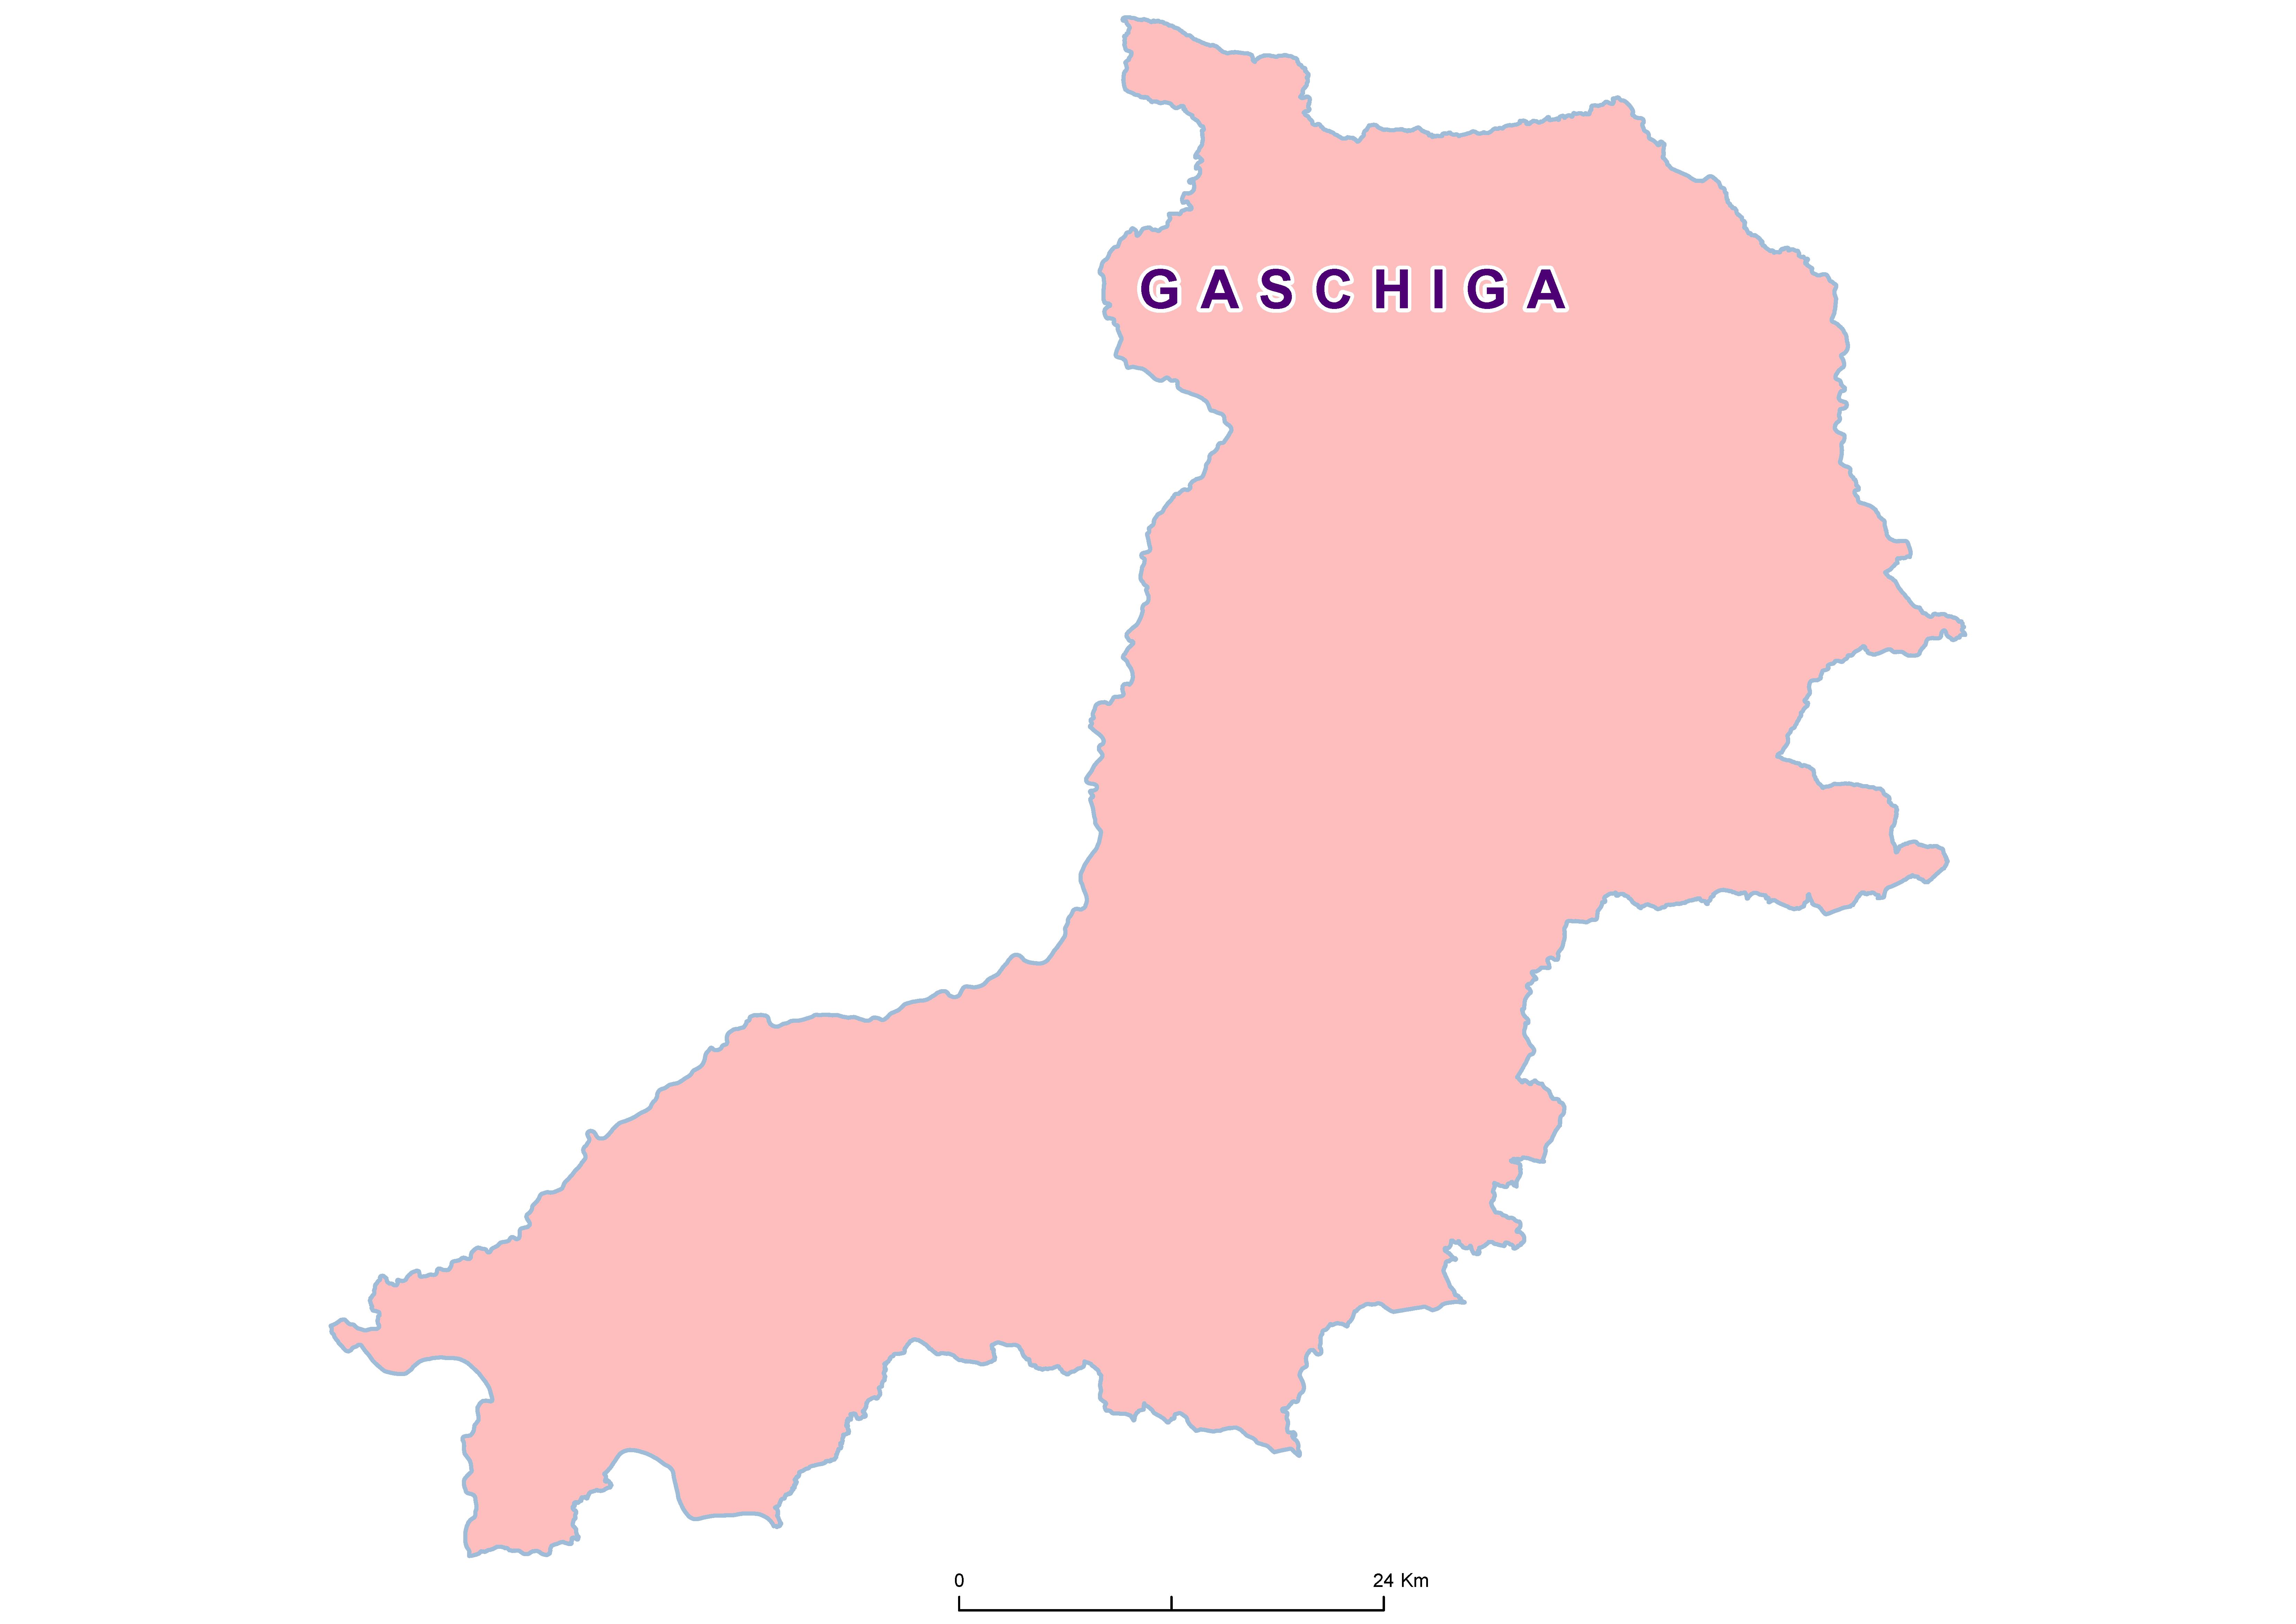 Gaschiga Mean STH 19850001